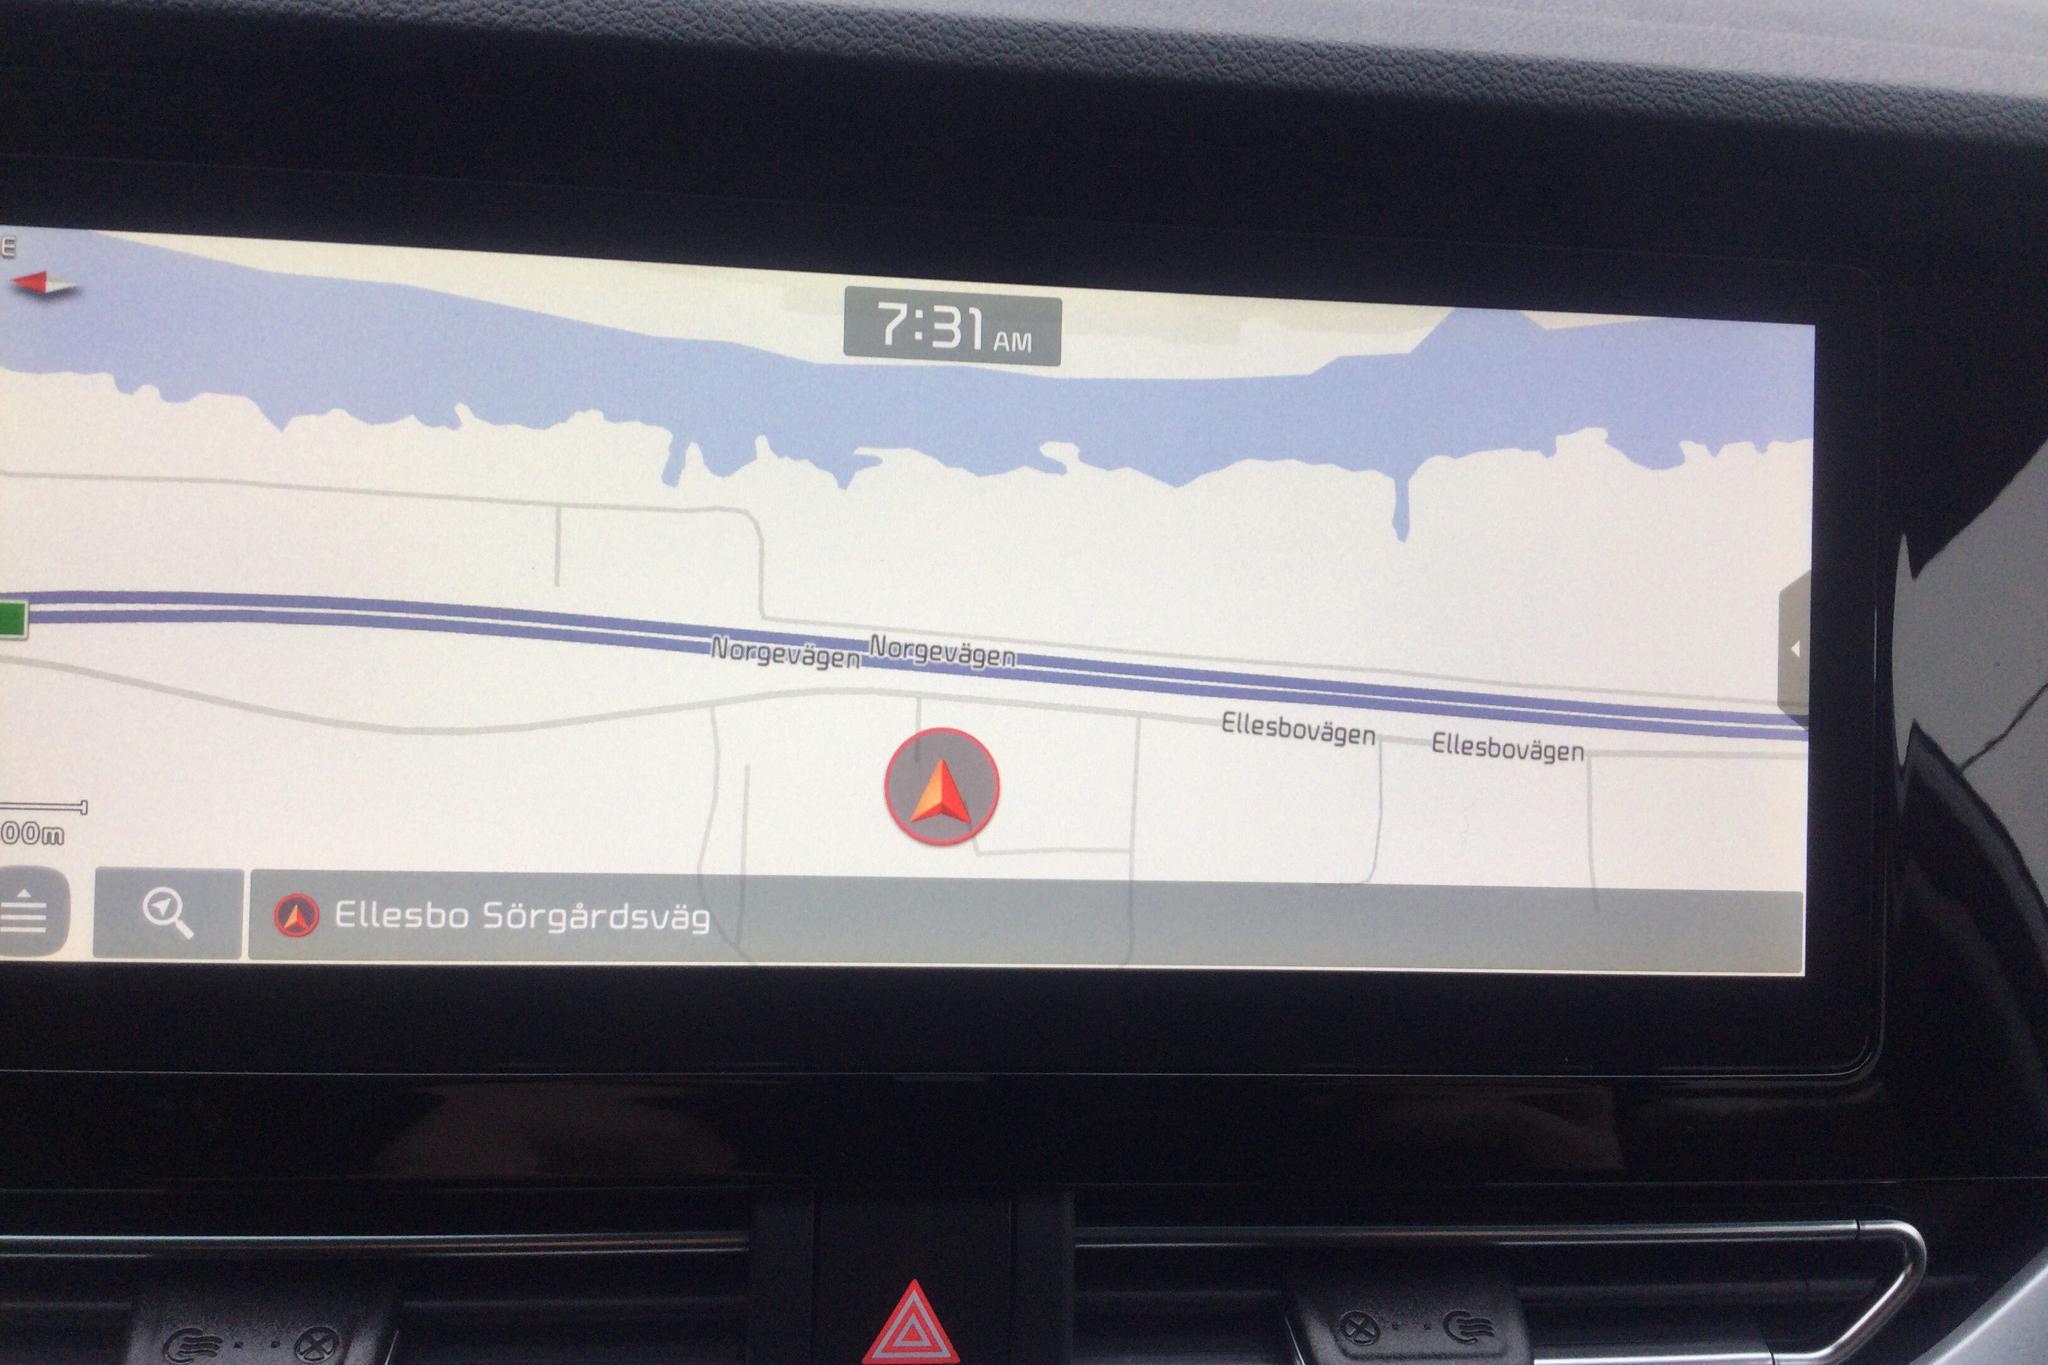 KIA Niro Plug-in Hybrid 1.6 LCI (141hk) - 4 480 km - Automatic - white - 2021